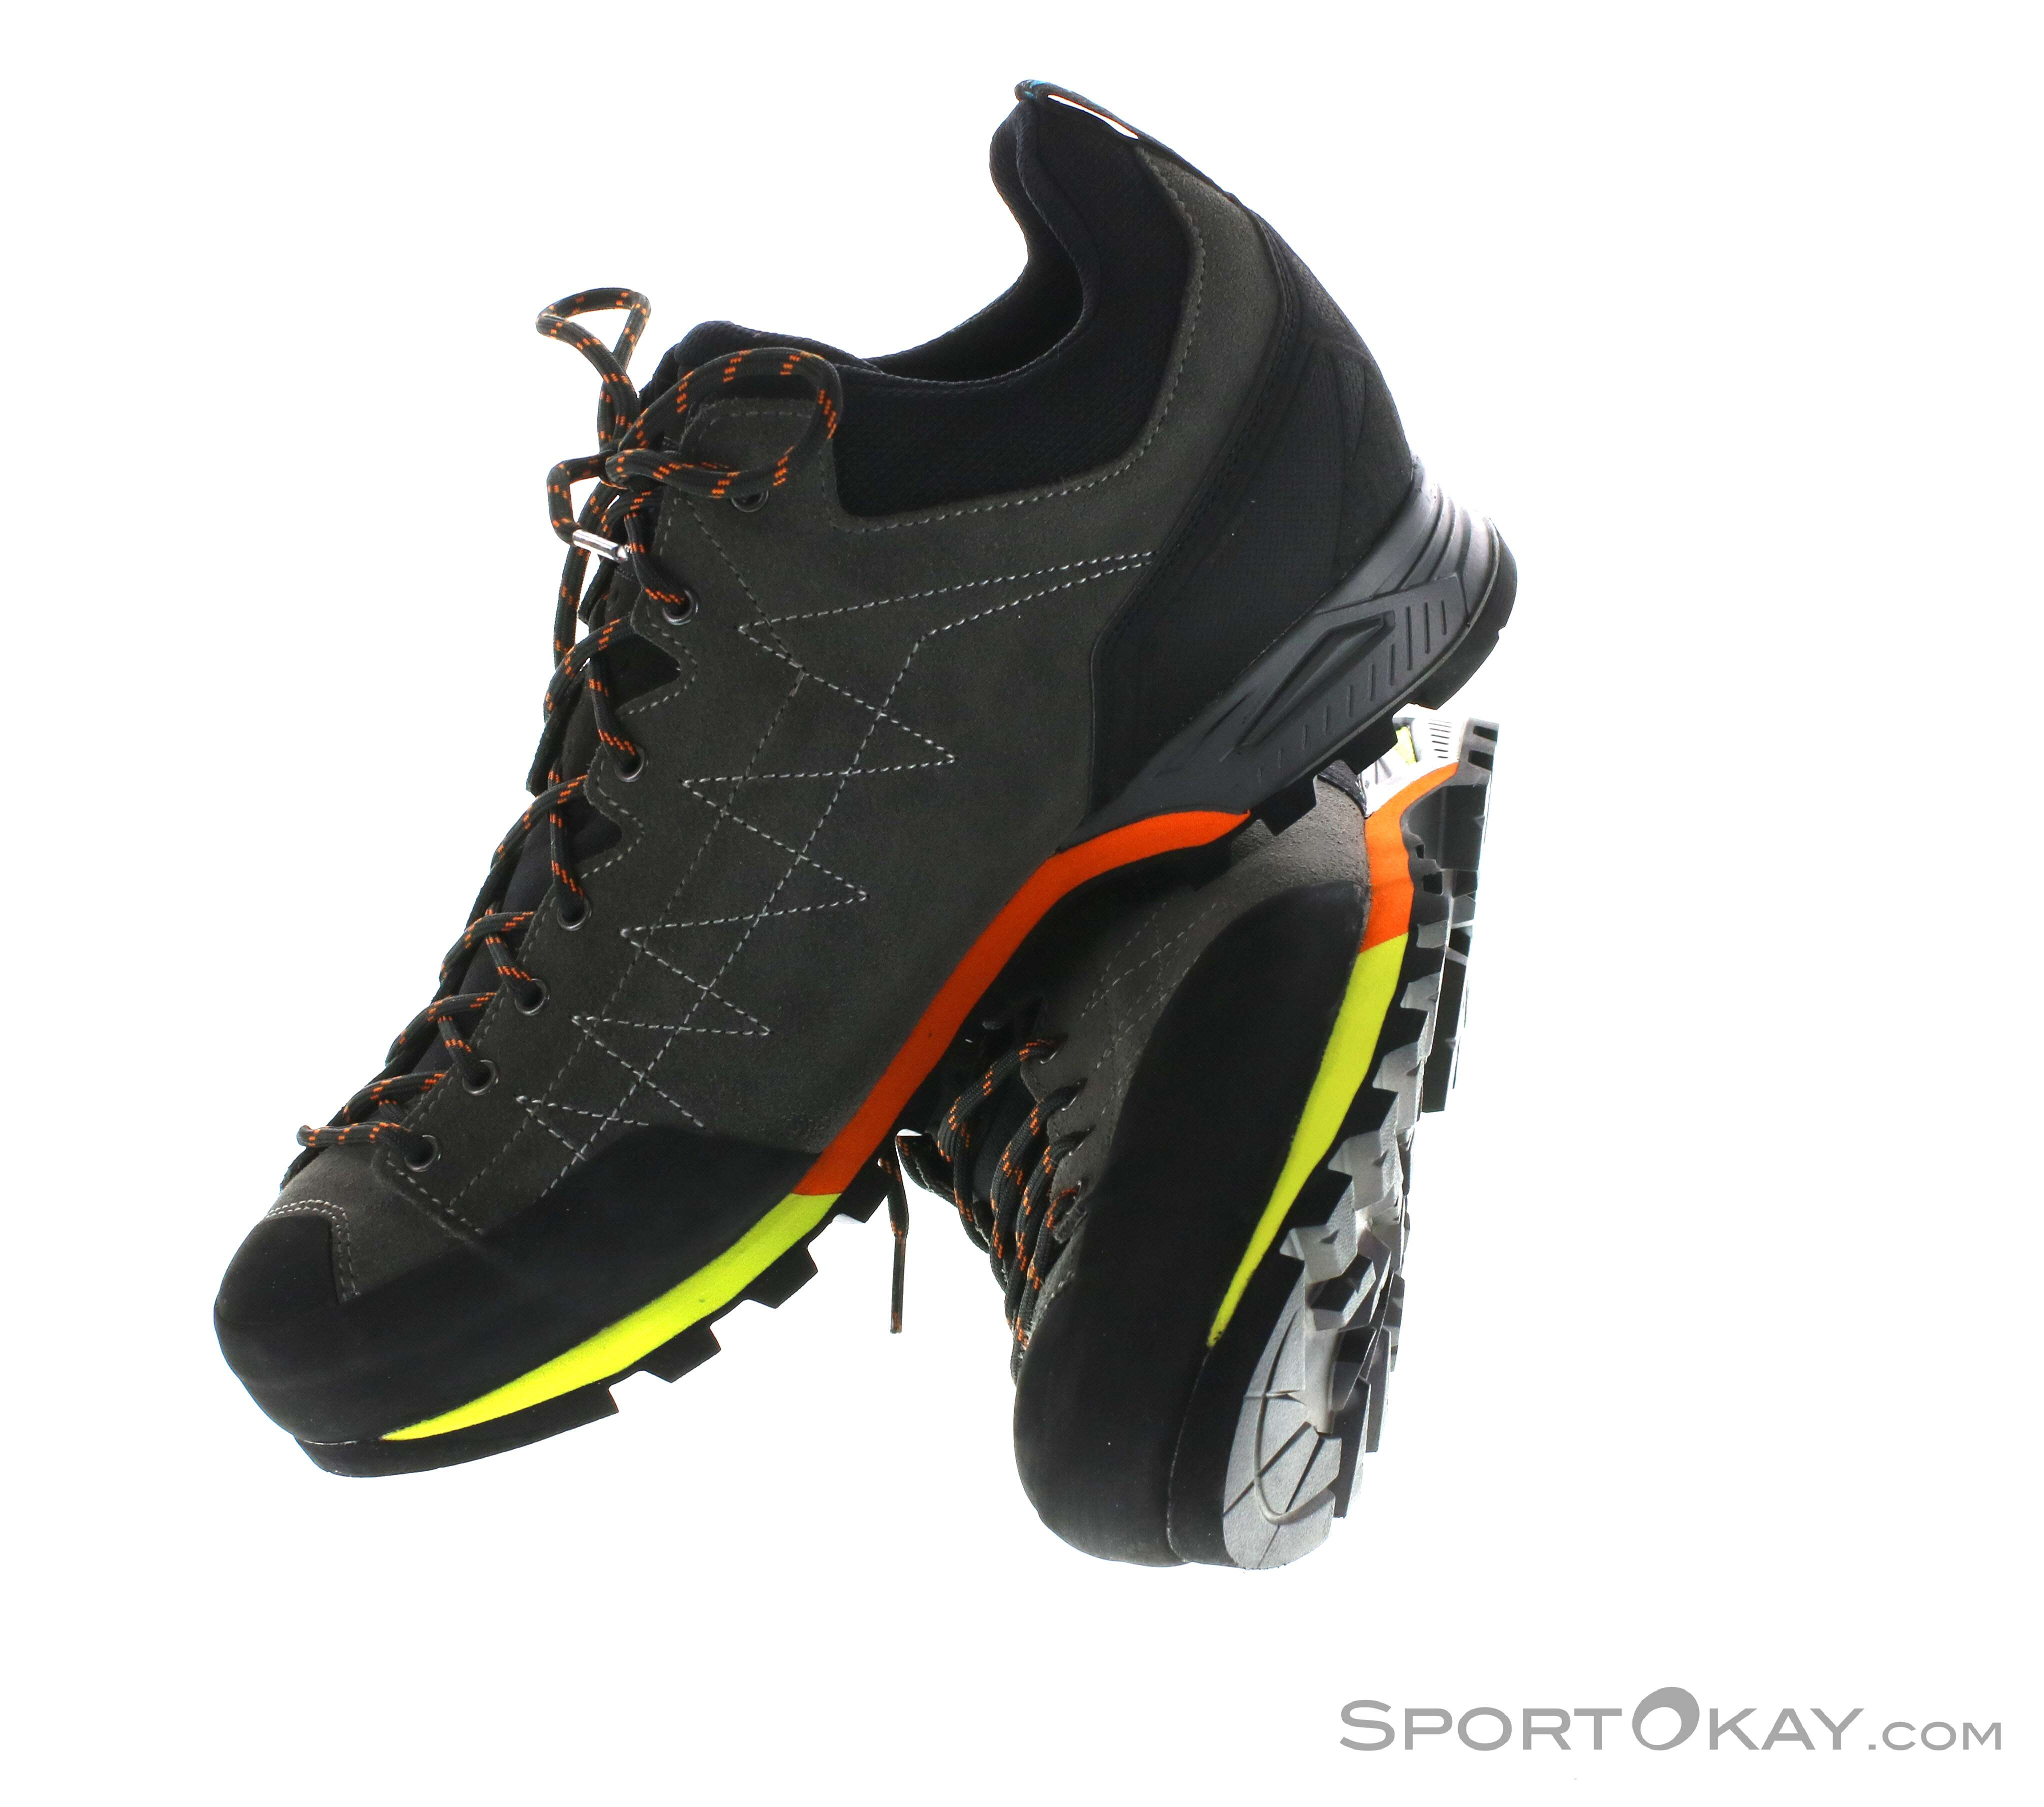 Scarpa Zodiac GTX Mens Approach Shoes Gore-Tex - Leisure Shoes ... 102d44a1f61e9